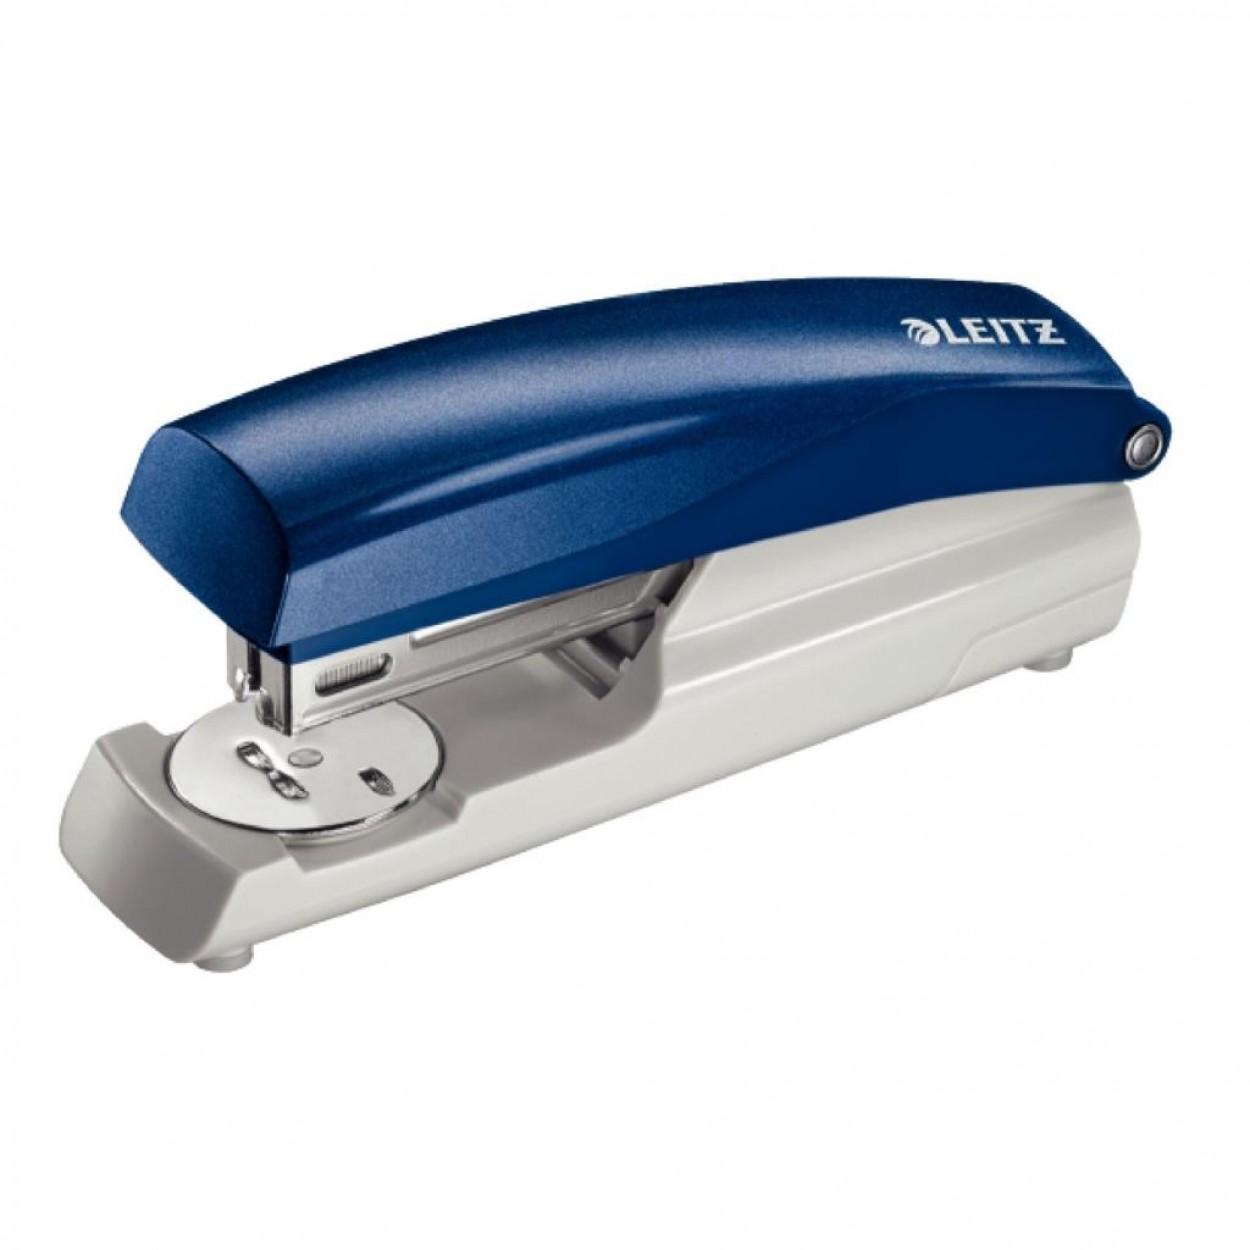 Leitz 5500 Mavi Zımba Makinesi (30 Sayfa Kapasiteli)